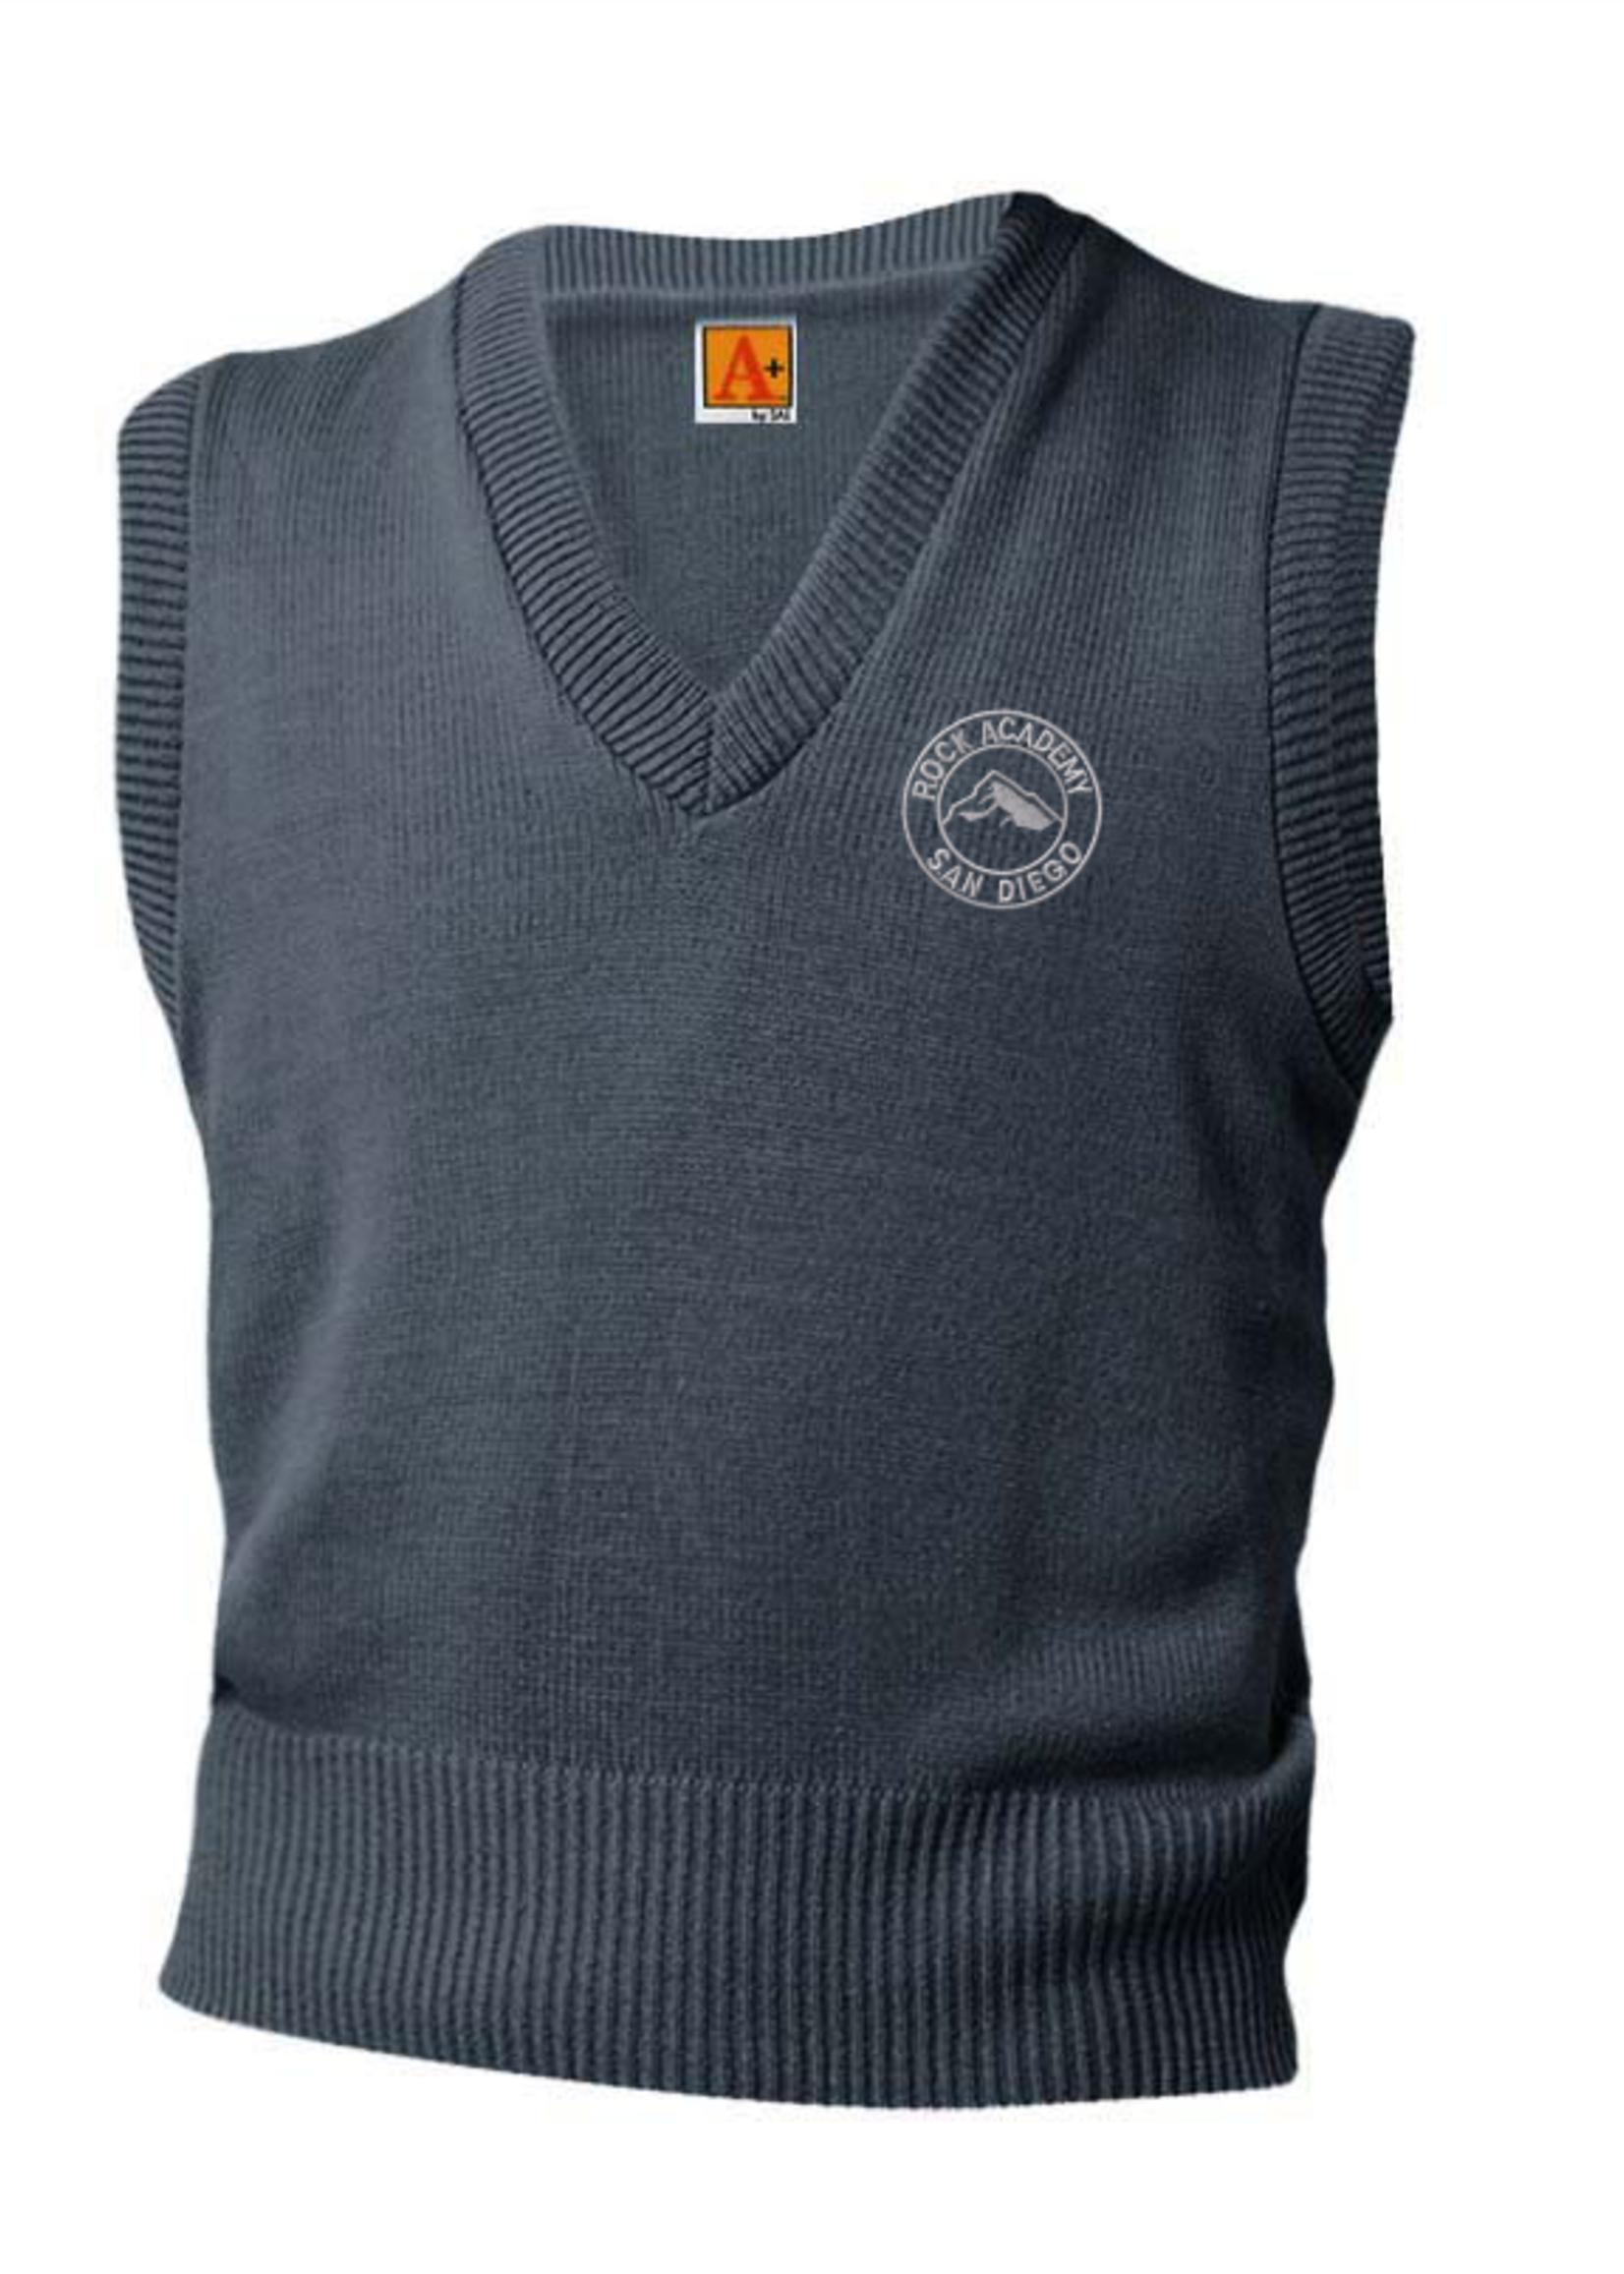 TUS ROCK V-neck sweater vest